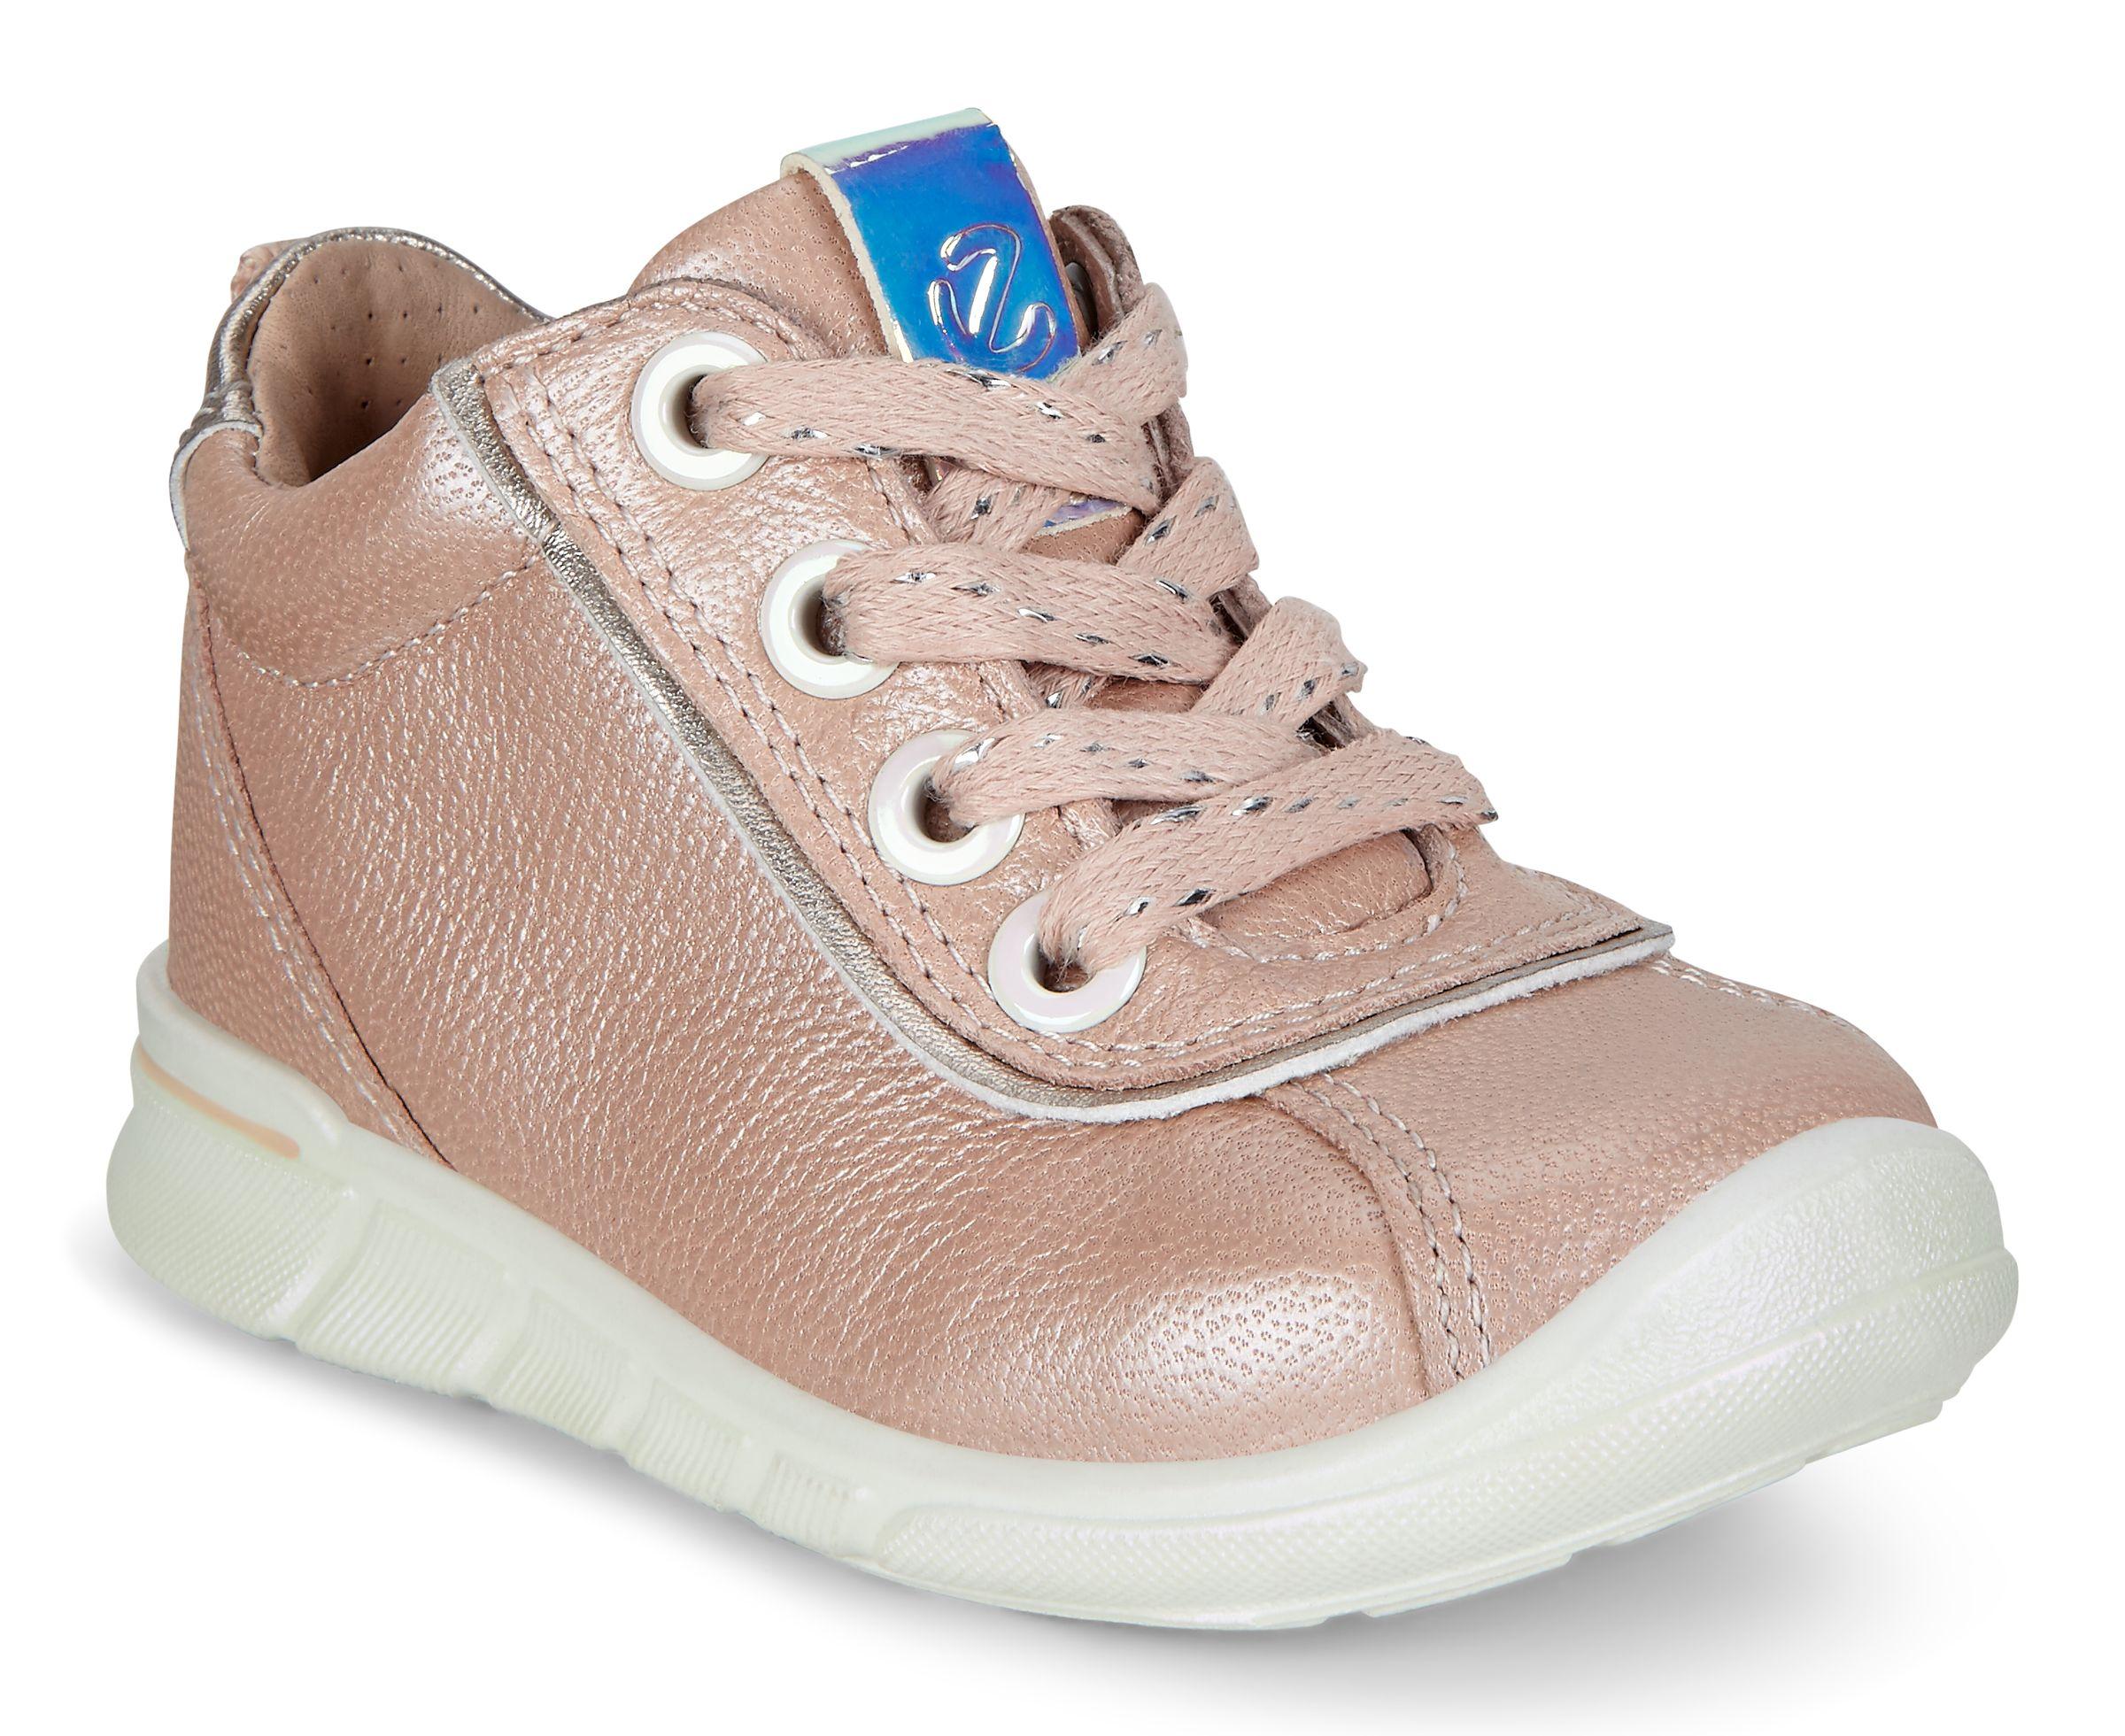 Ecco First støvle